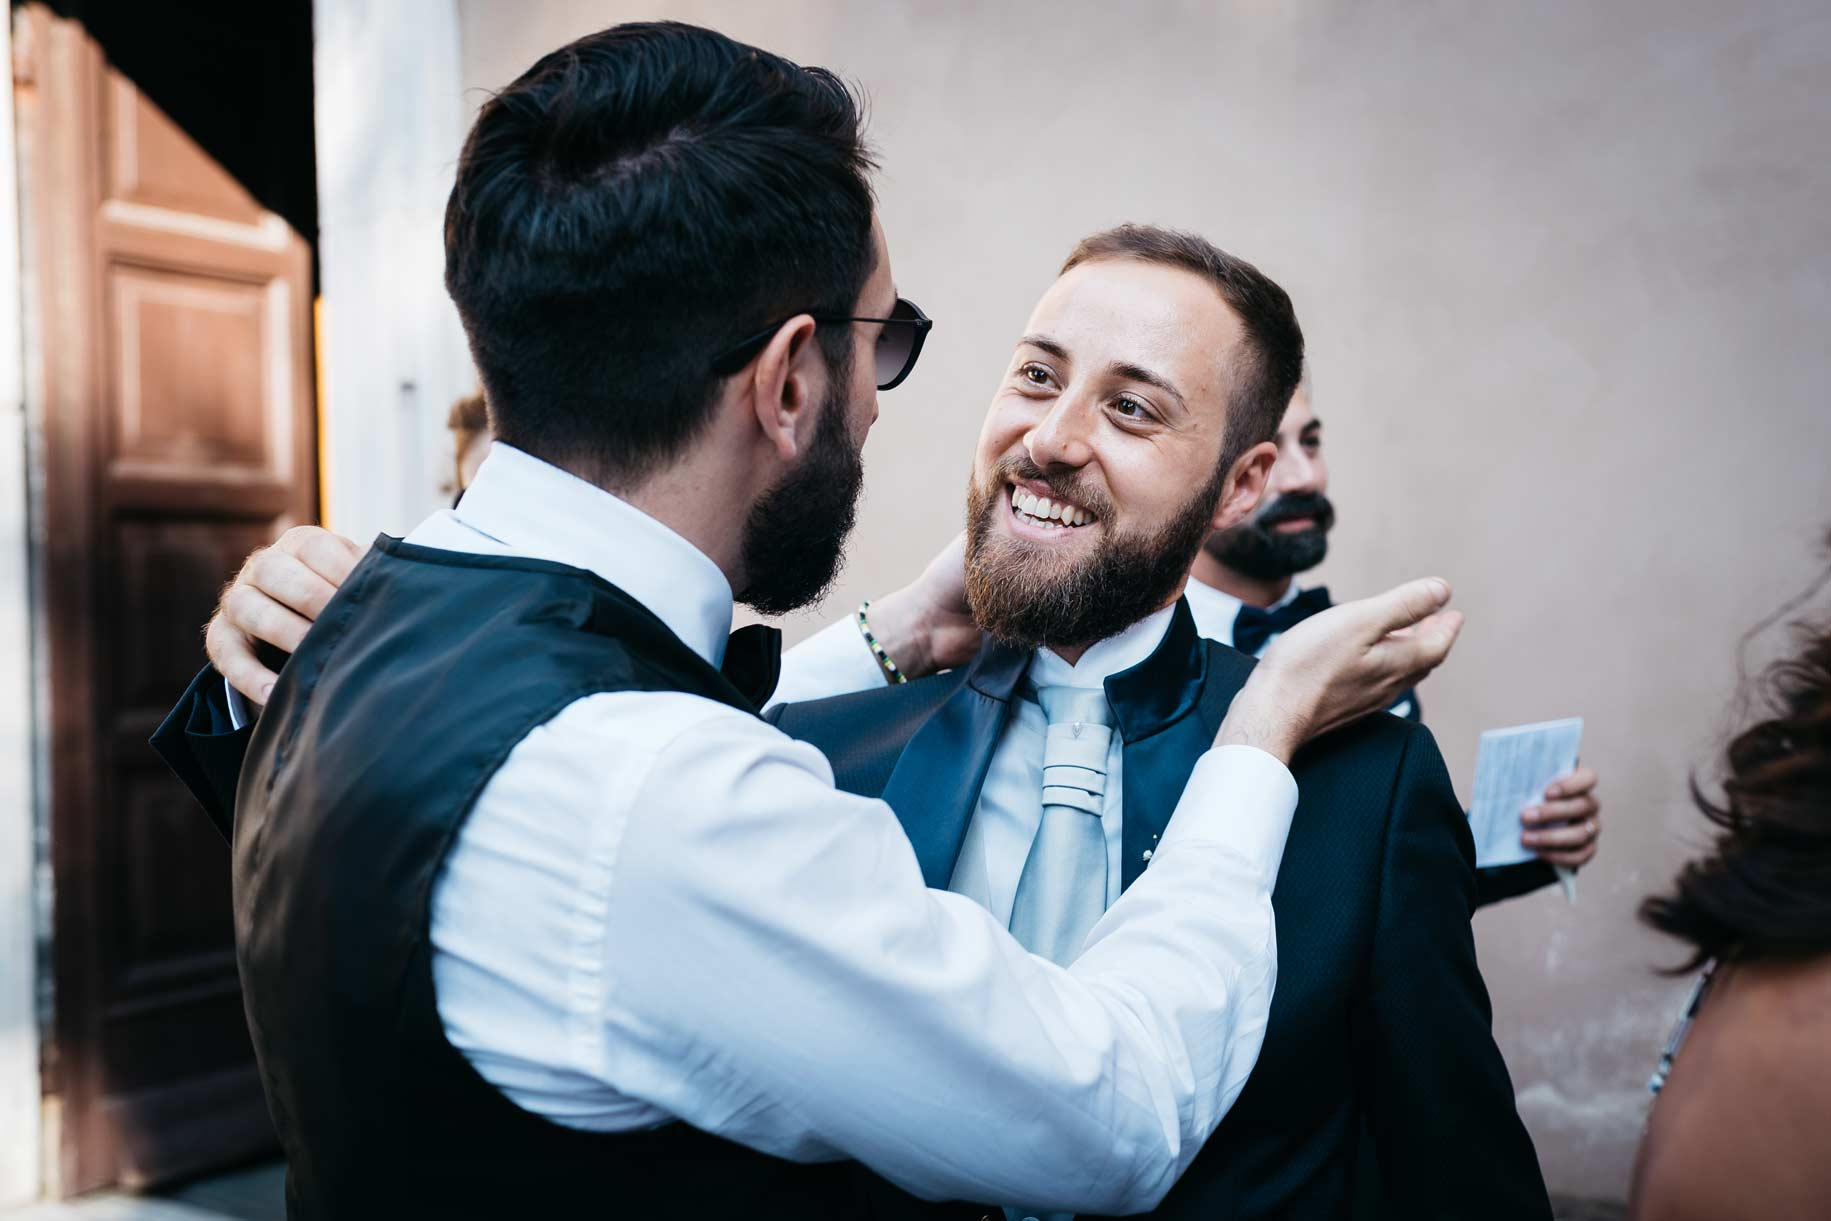 Reportage-Wedding-Photography-1-Ceremony